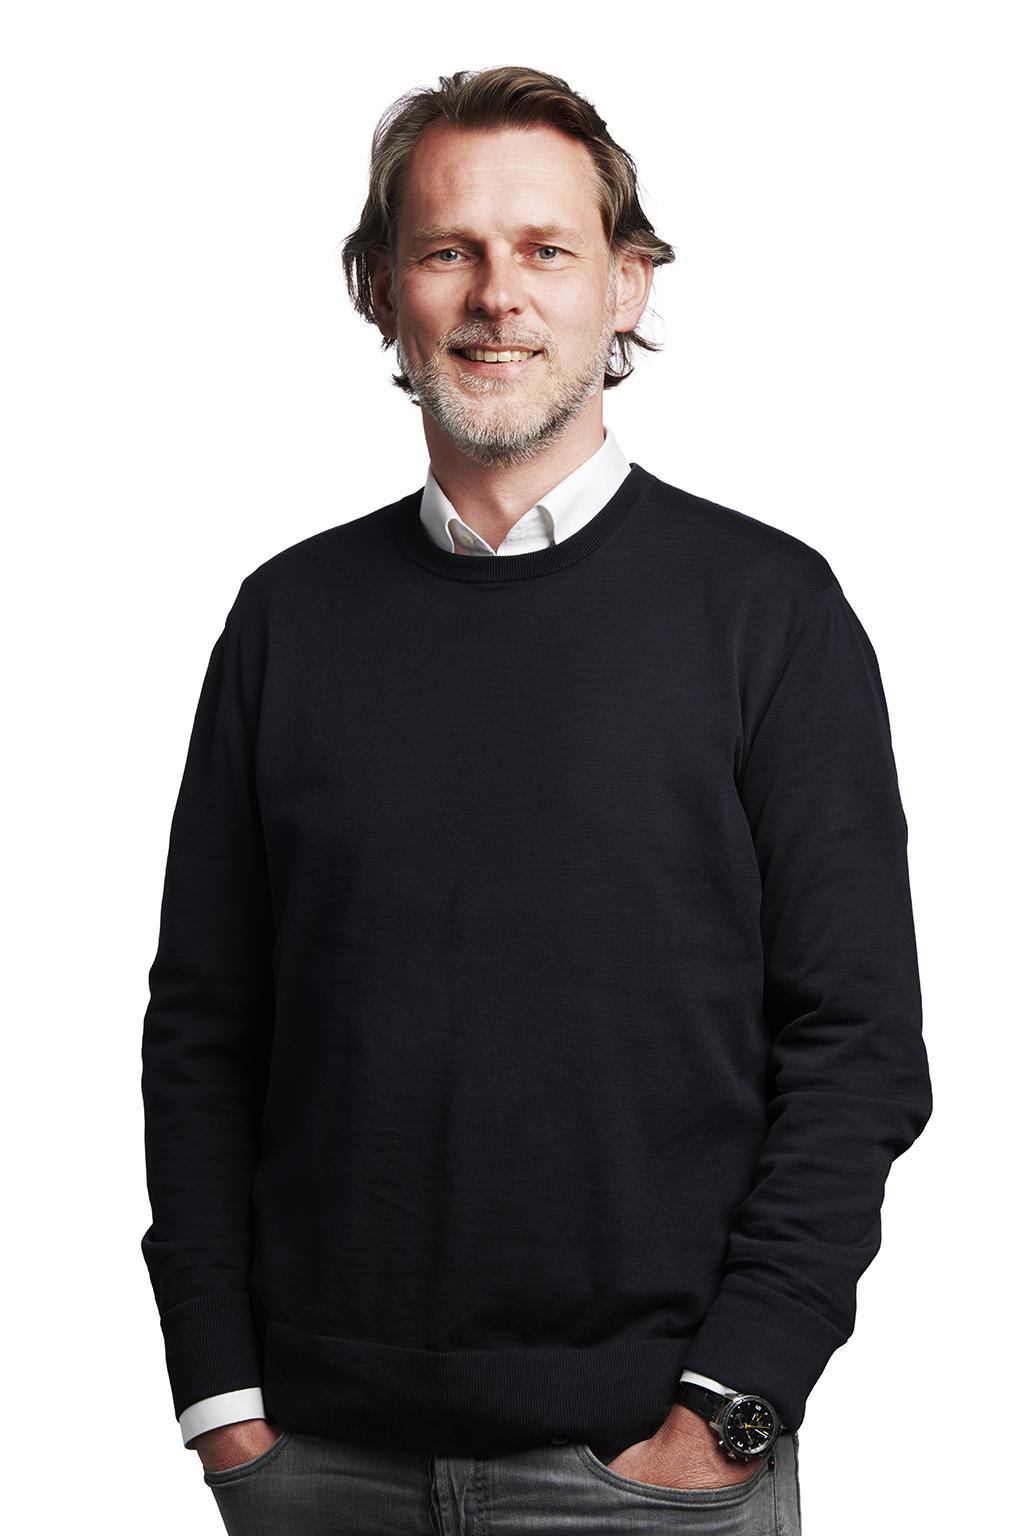 Rick Uringa Challanger, strategisch adviseur, trainer